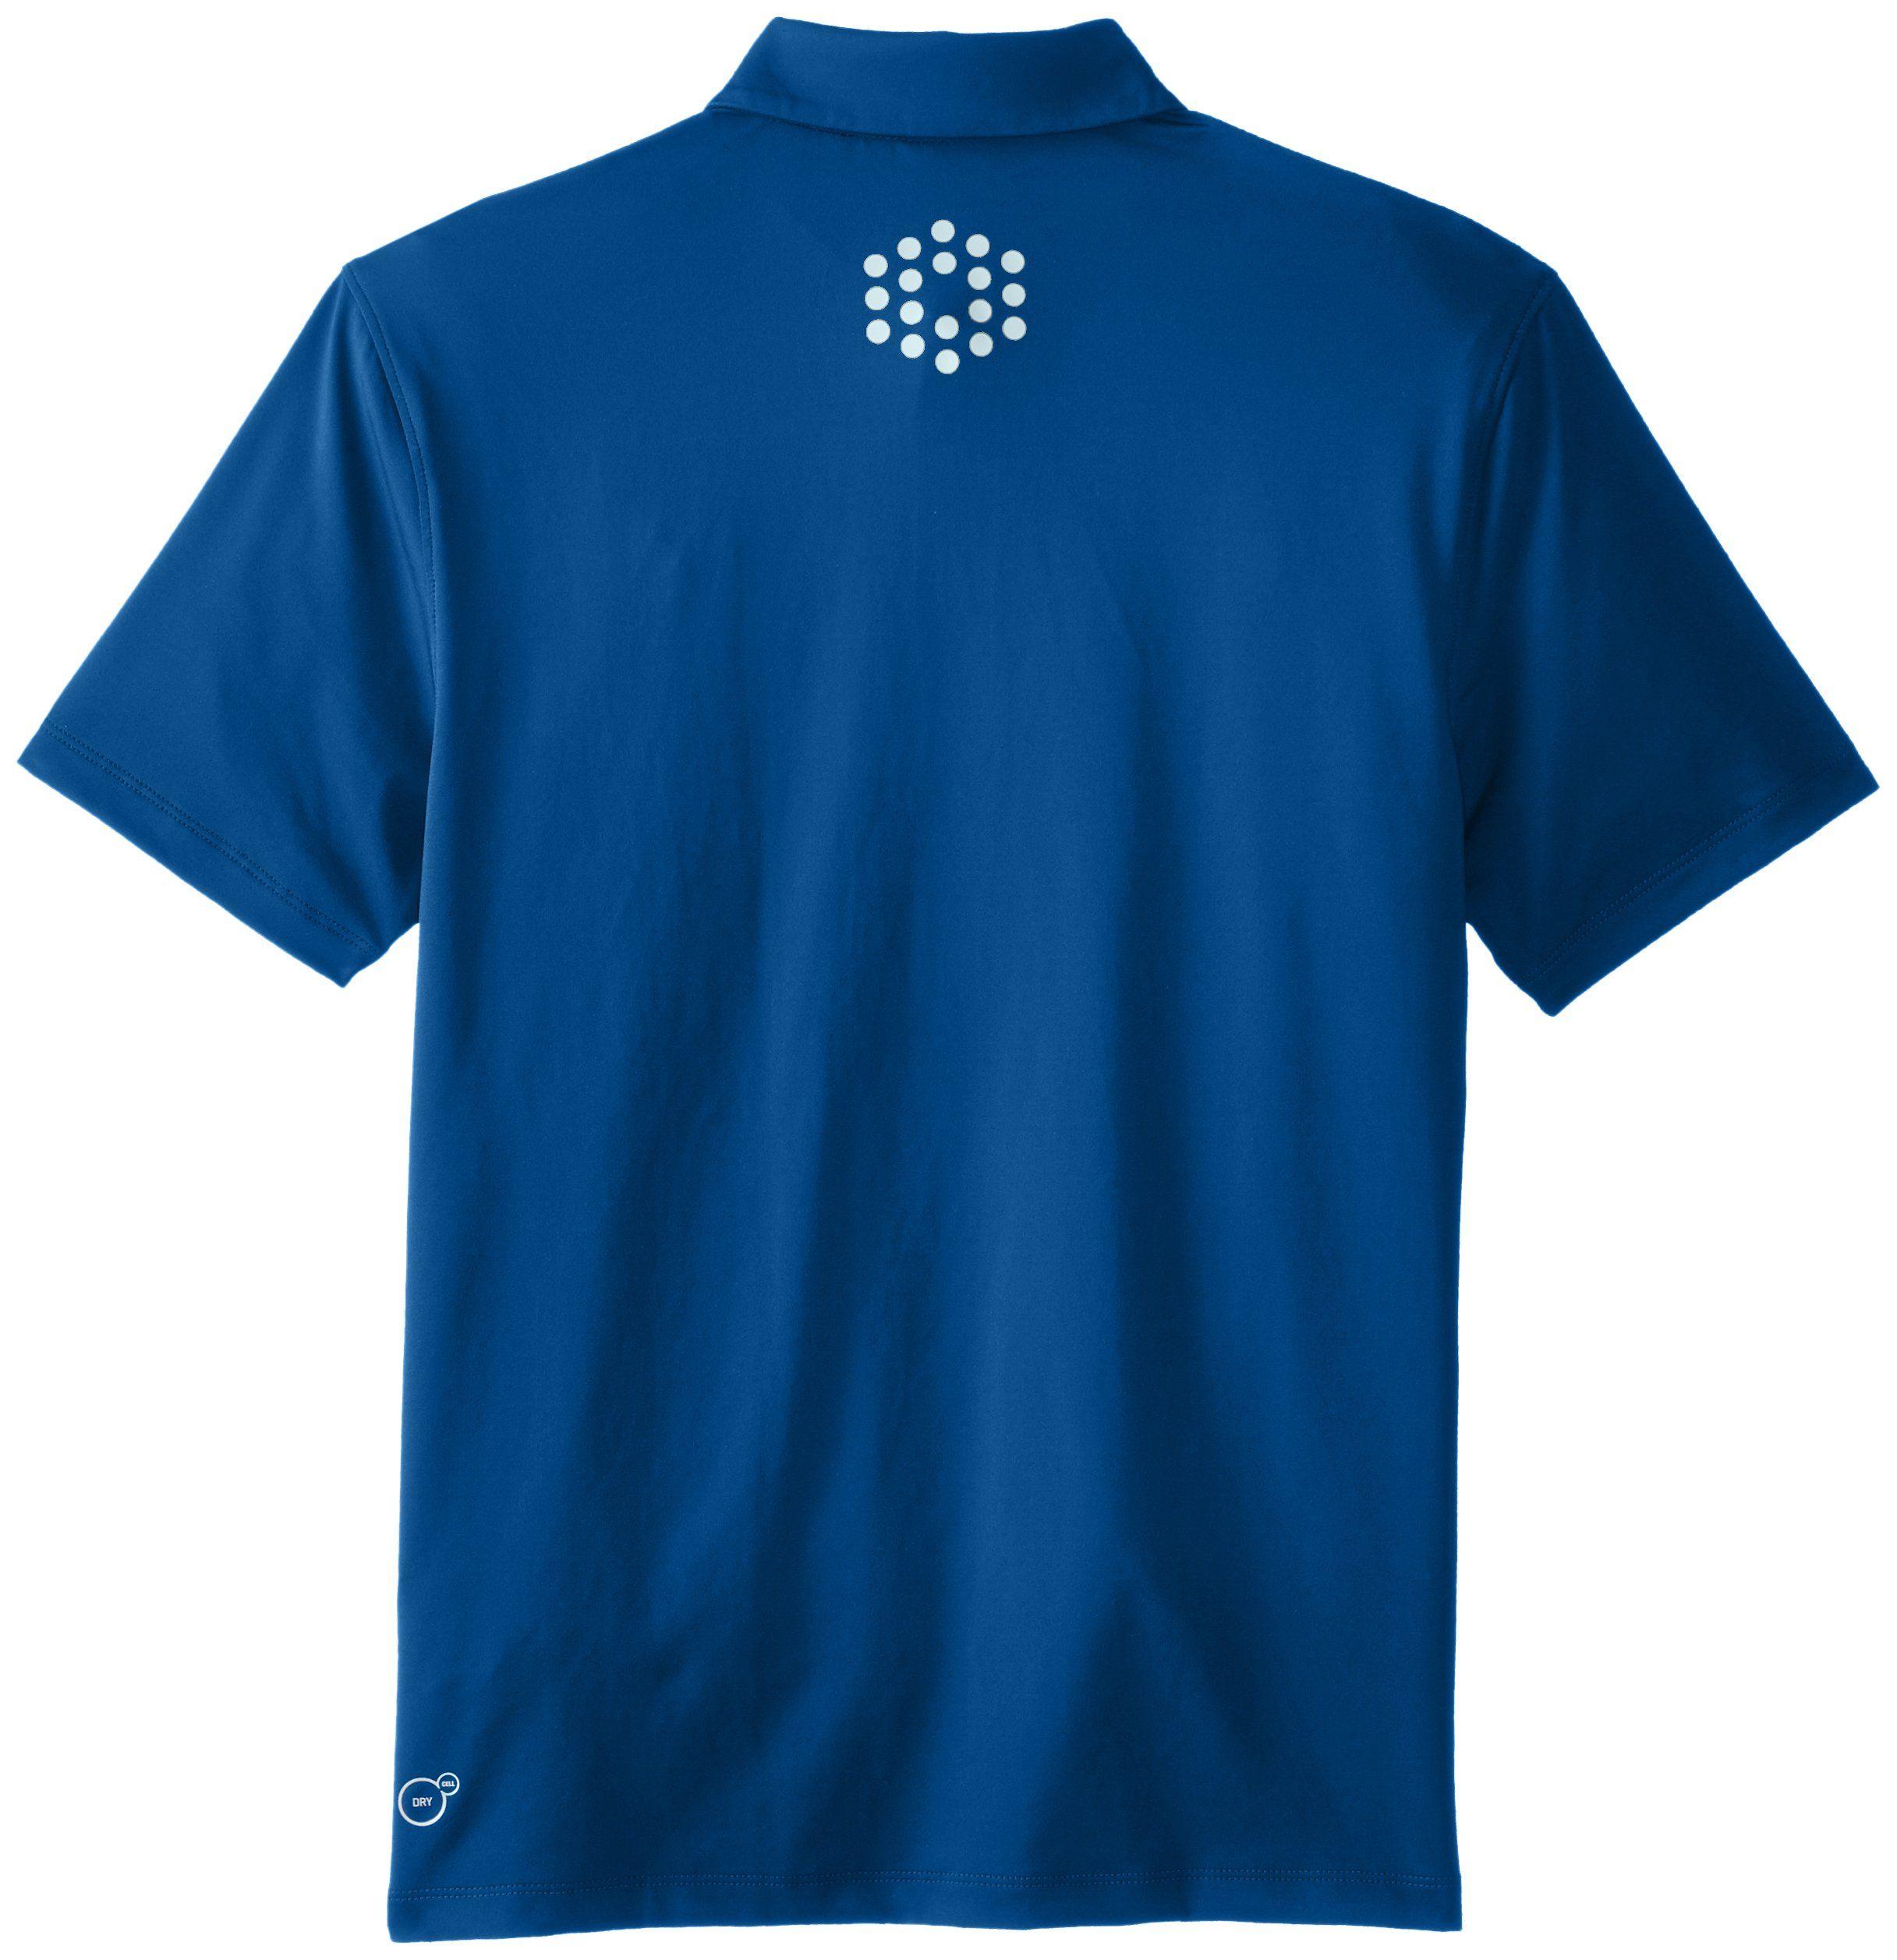 2720635e1c38 PUMA Golf Junior Boys Road Map Polo Shirt Large Poseidon     Want to know  more